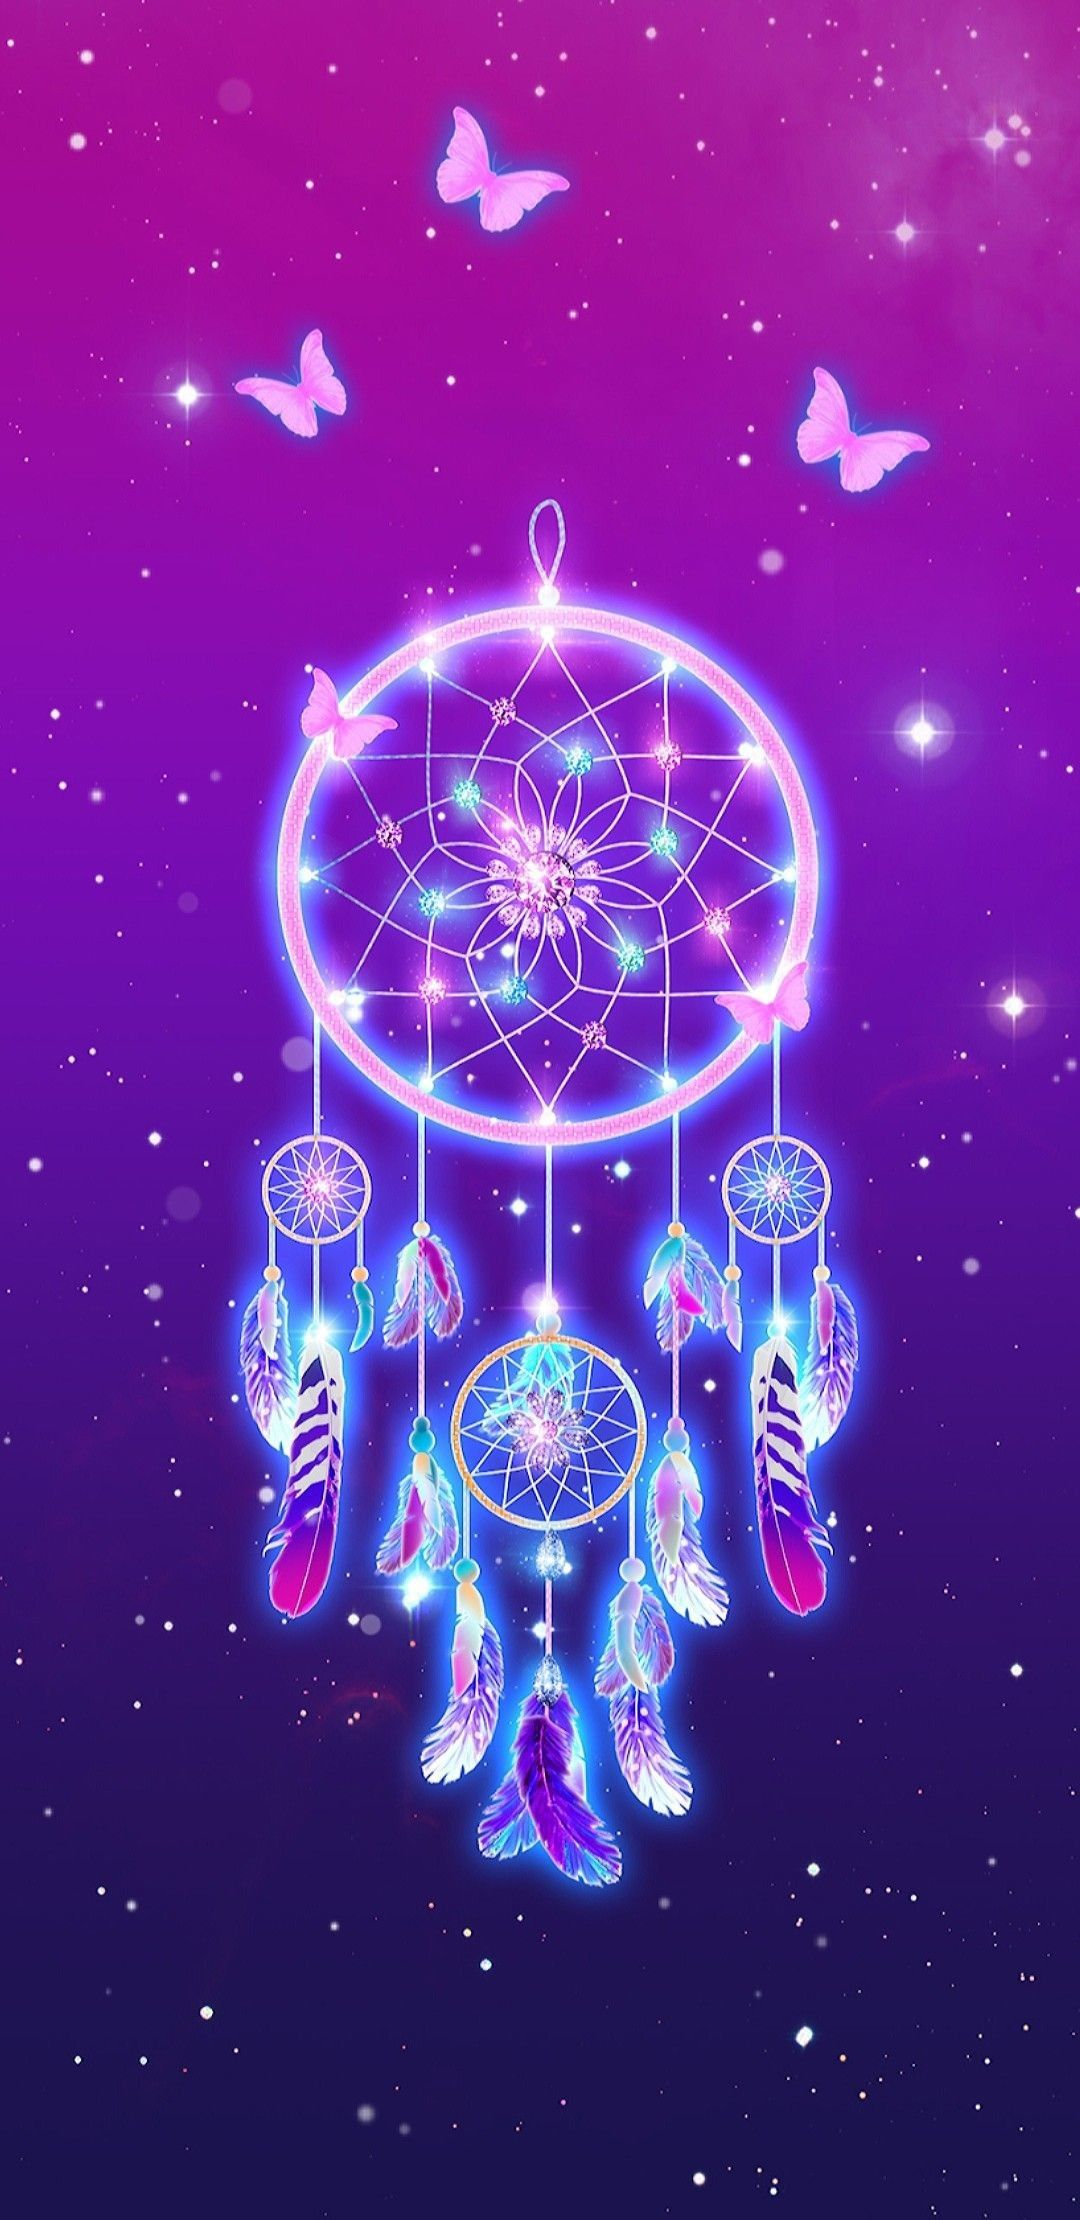 Glitter Girly Galaxy Wallpaper : glitter, girly, galaxy, wallpaper, Glitter, Galaxy, Wallpapers, Wallpaper